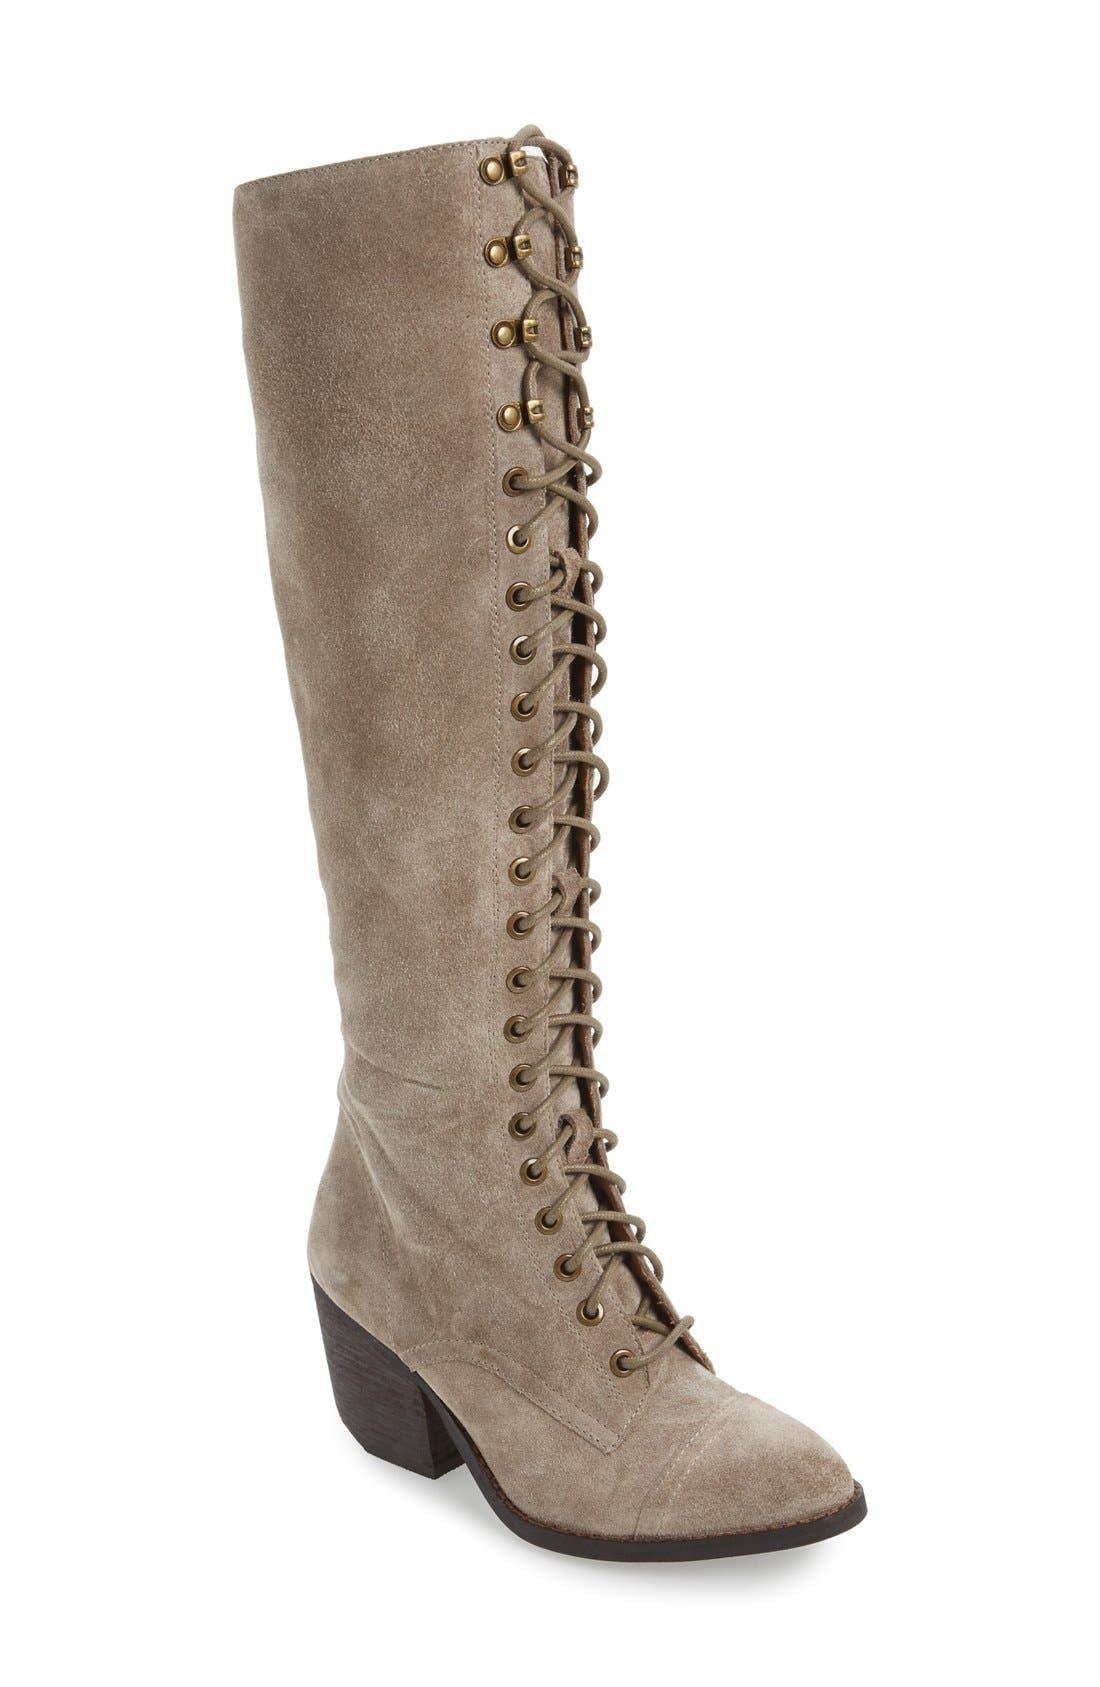 Alternate Image 1 Selected - Jeffrey Campbell 'Kandace' Lace-Up Tall Boot (Women)